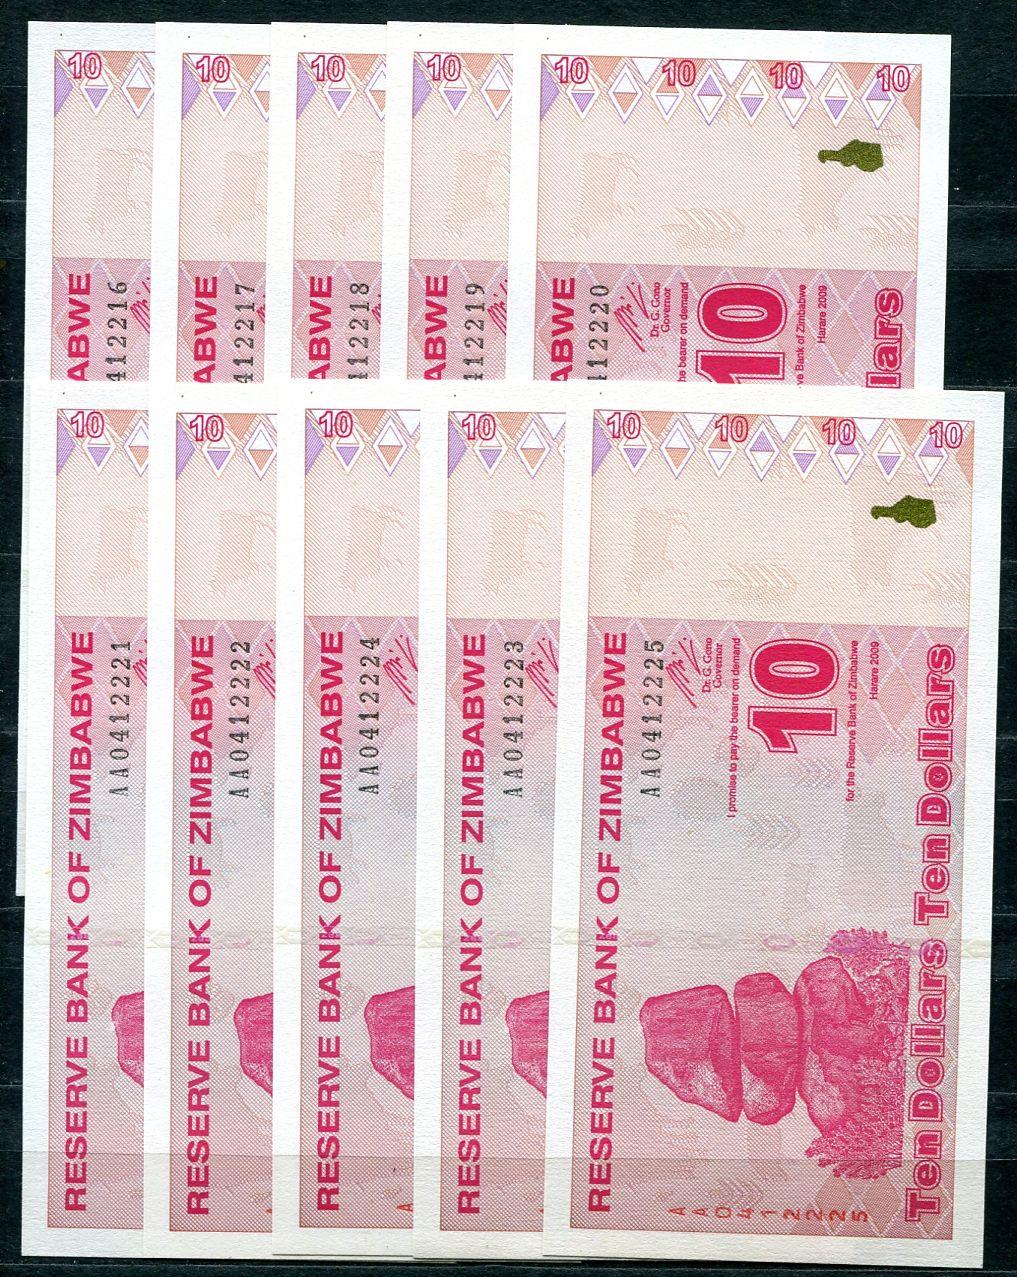 10x Zimbabwe - (P 94) 10 dollars (2009) - UNC10x Zimbabwe - (P 94) 10 dollars (2009) - UNC